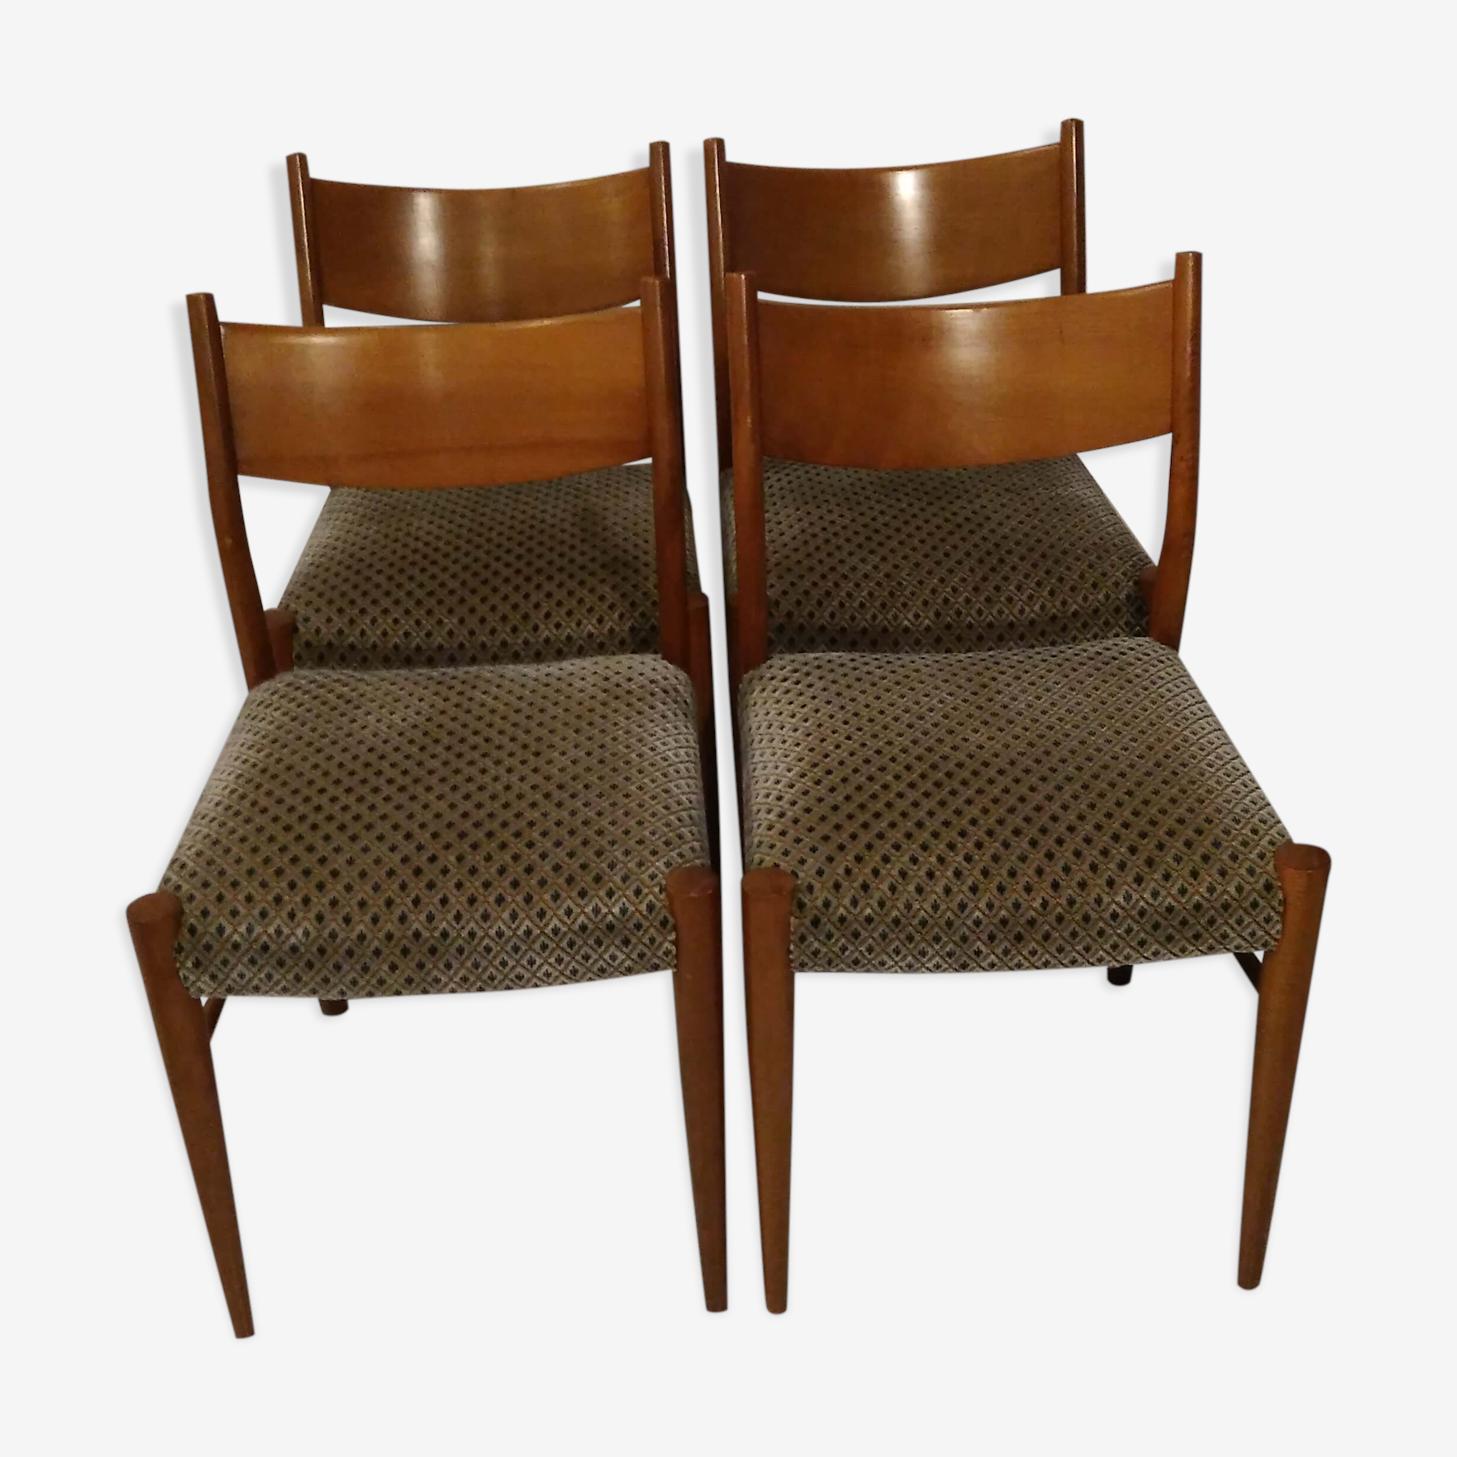 Chaises style scandinave années 60